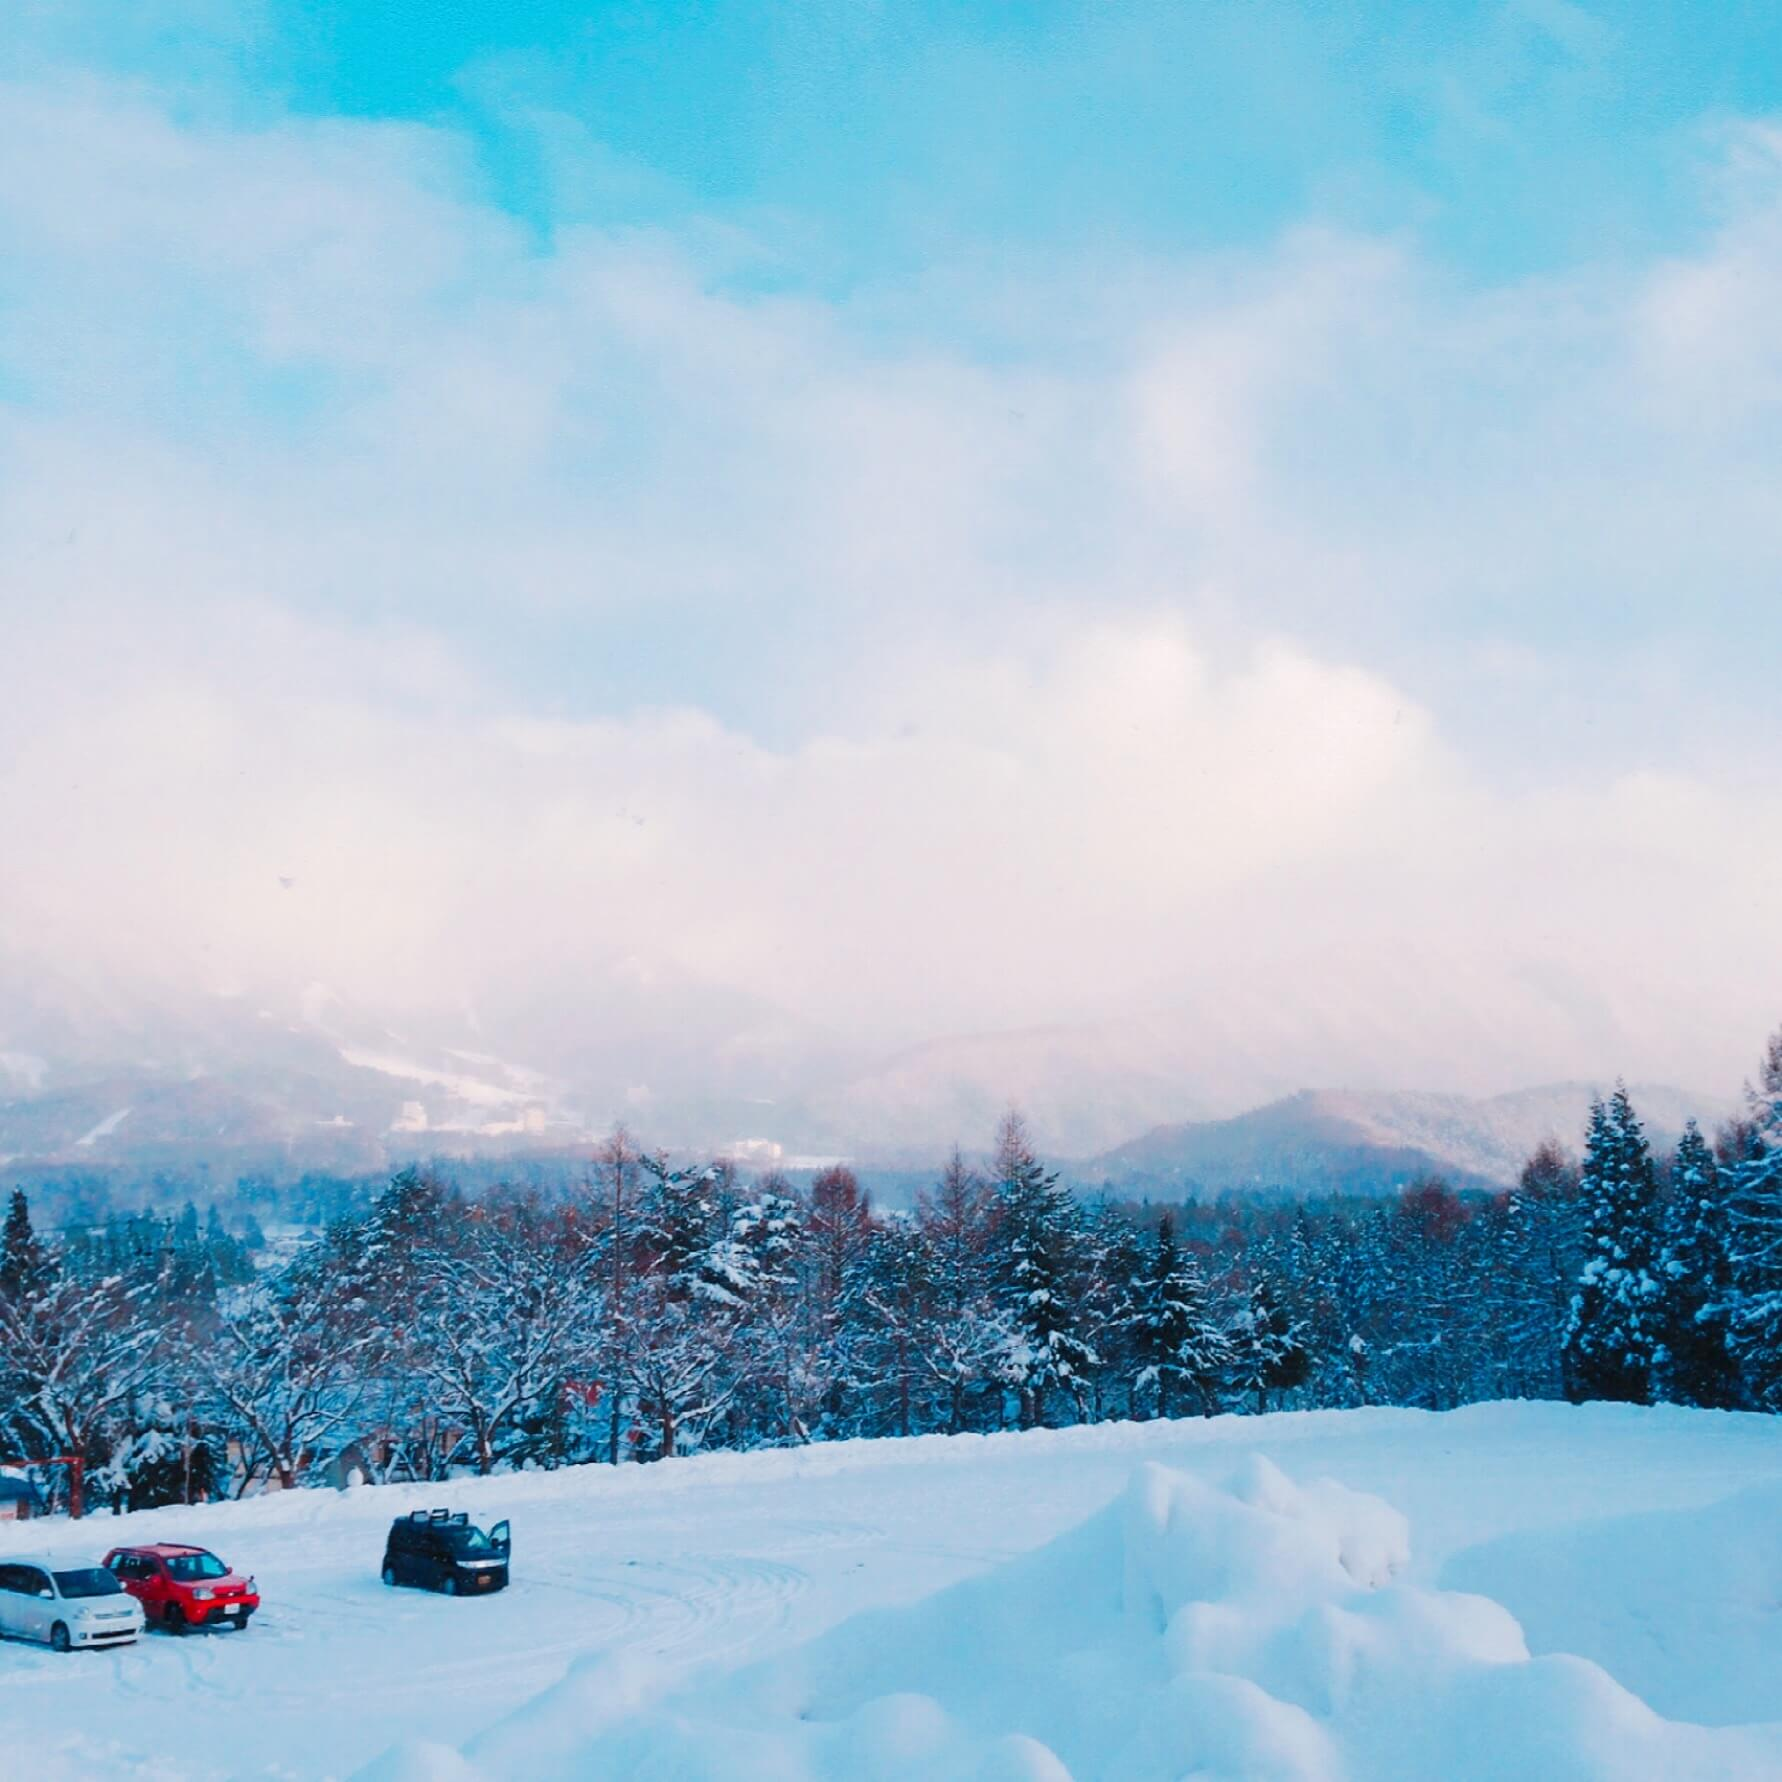 blue-snow-sky-winter